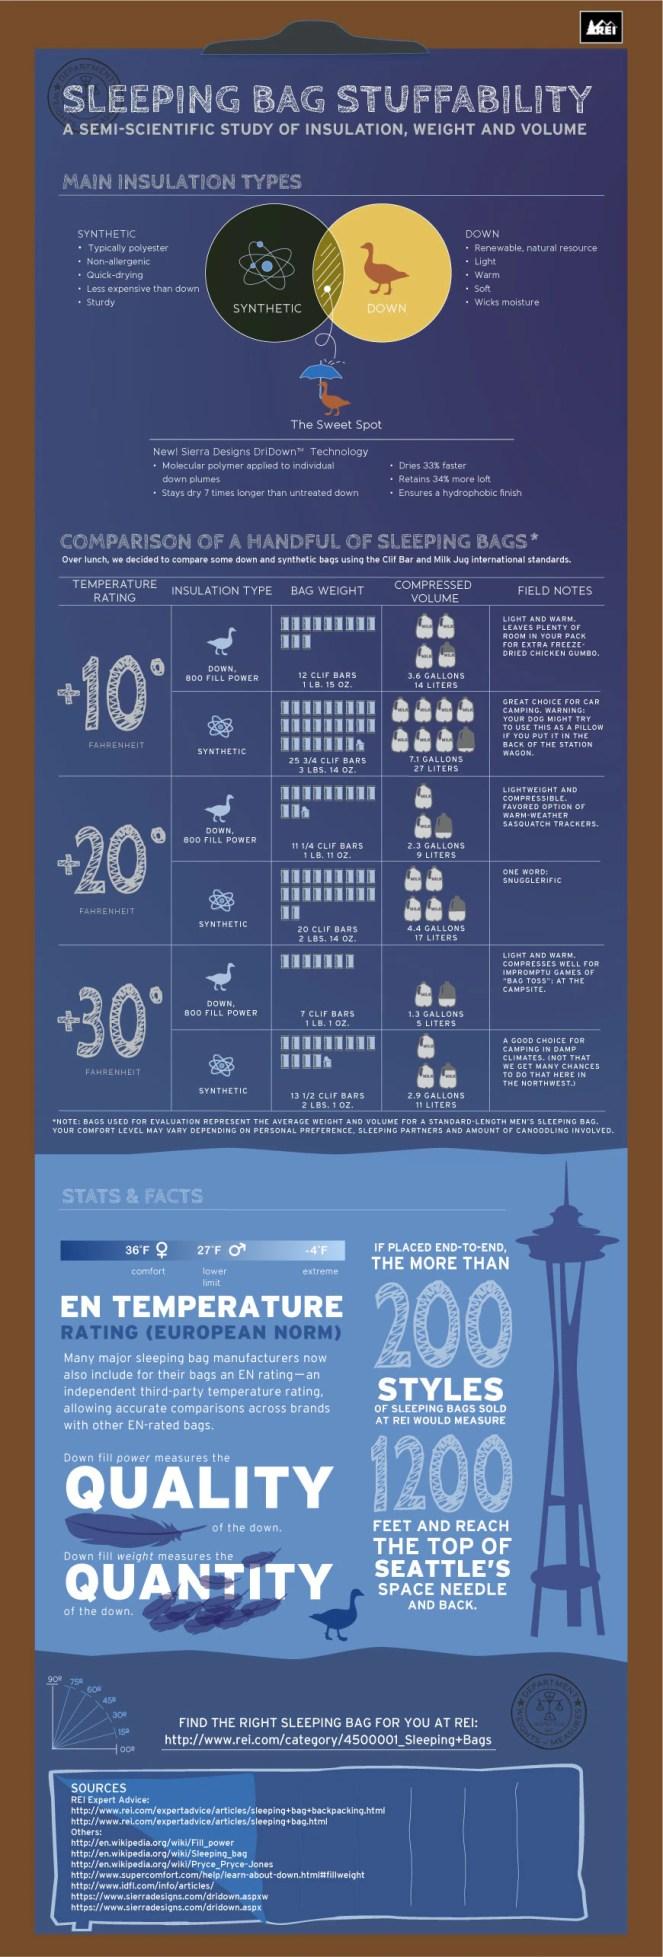 Sleeping Bags Infographic: Choosing a 3-Season Sleeping Bag